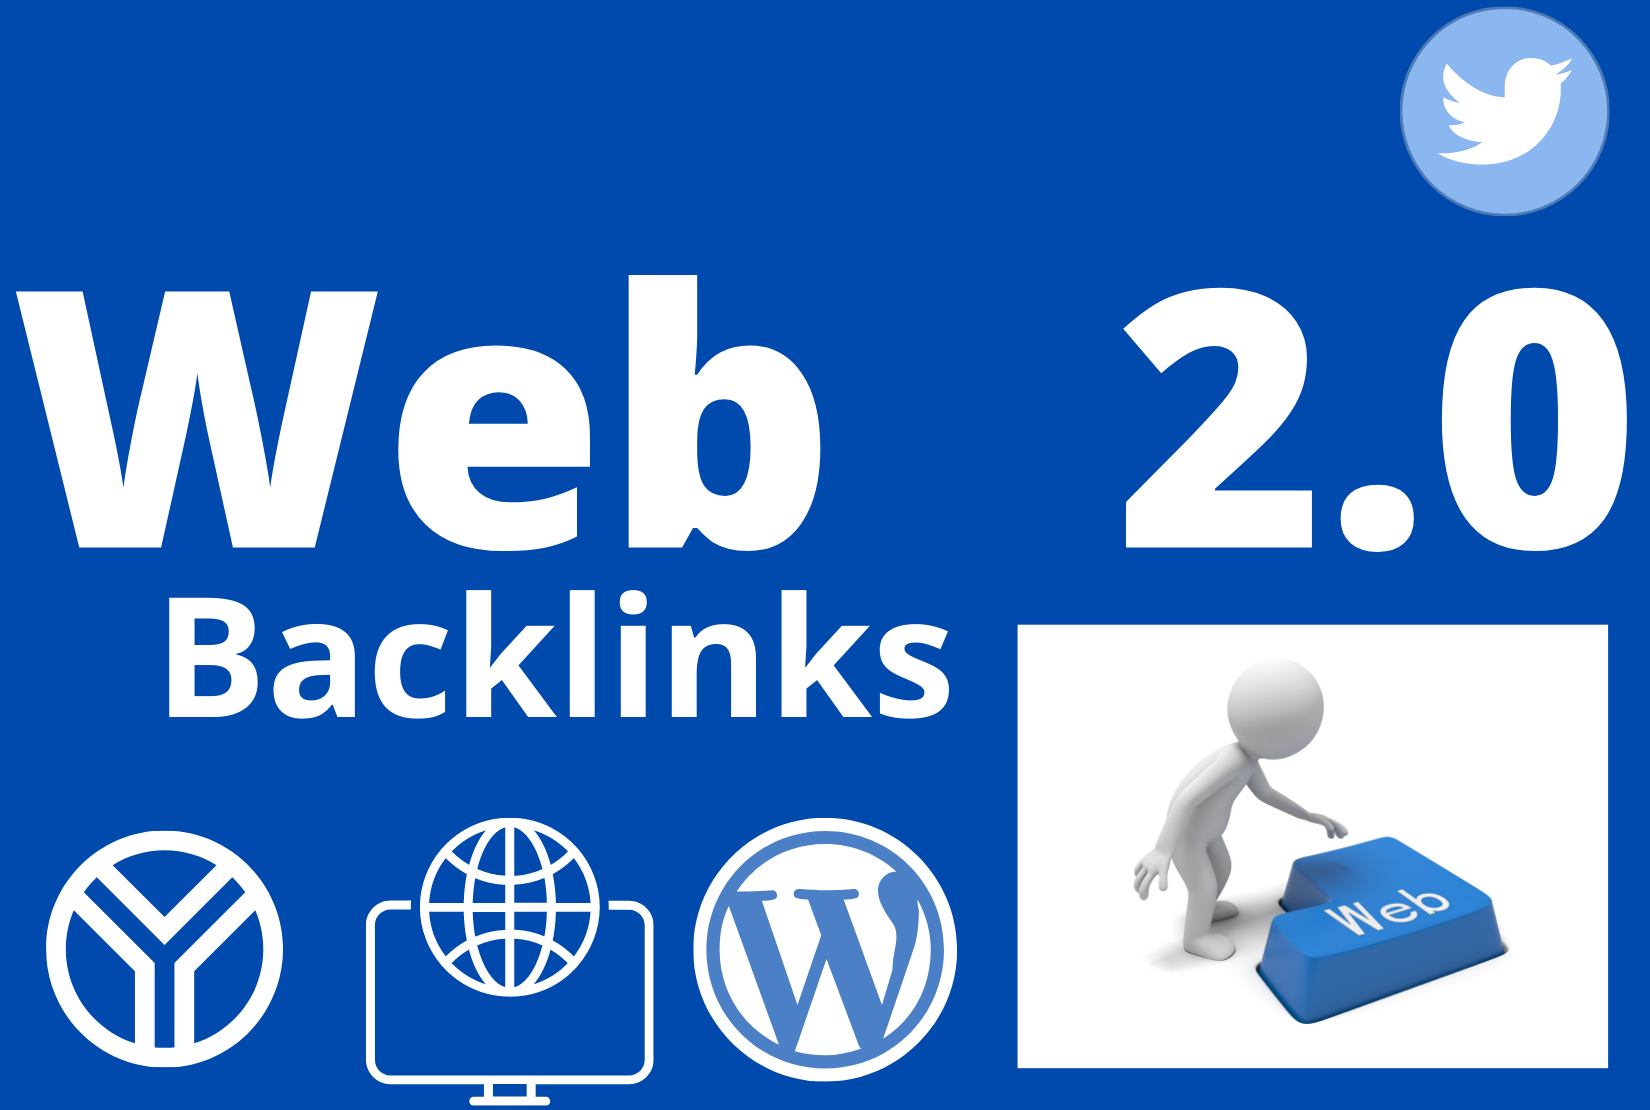 I will create 20 High Authority Do- Follow Web 2.0 Backlinks